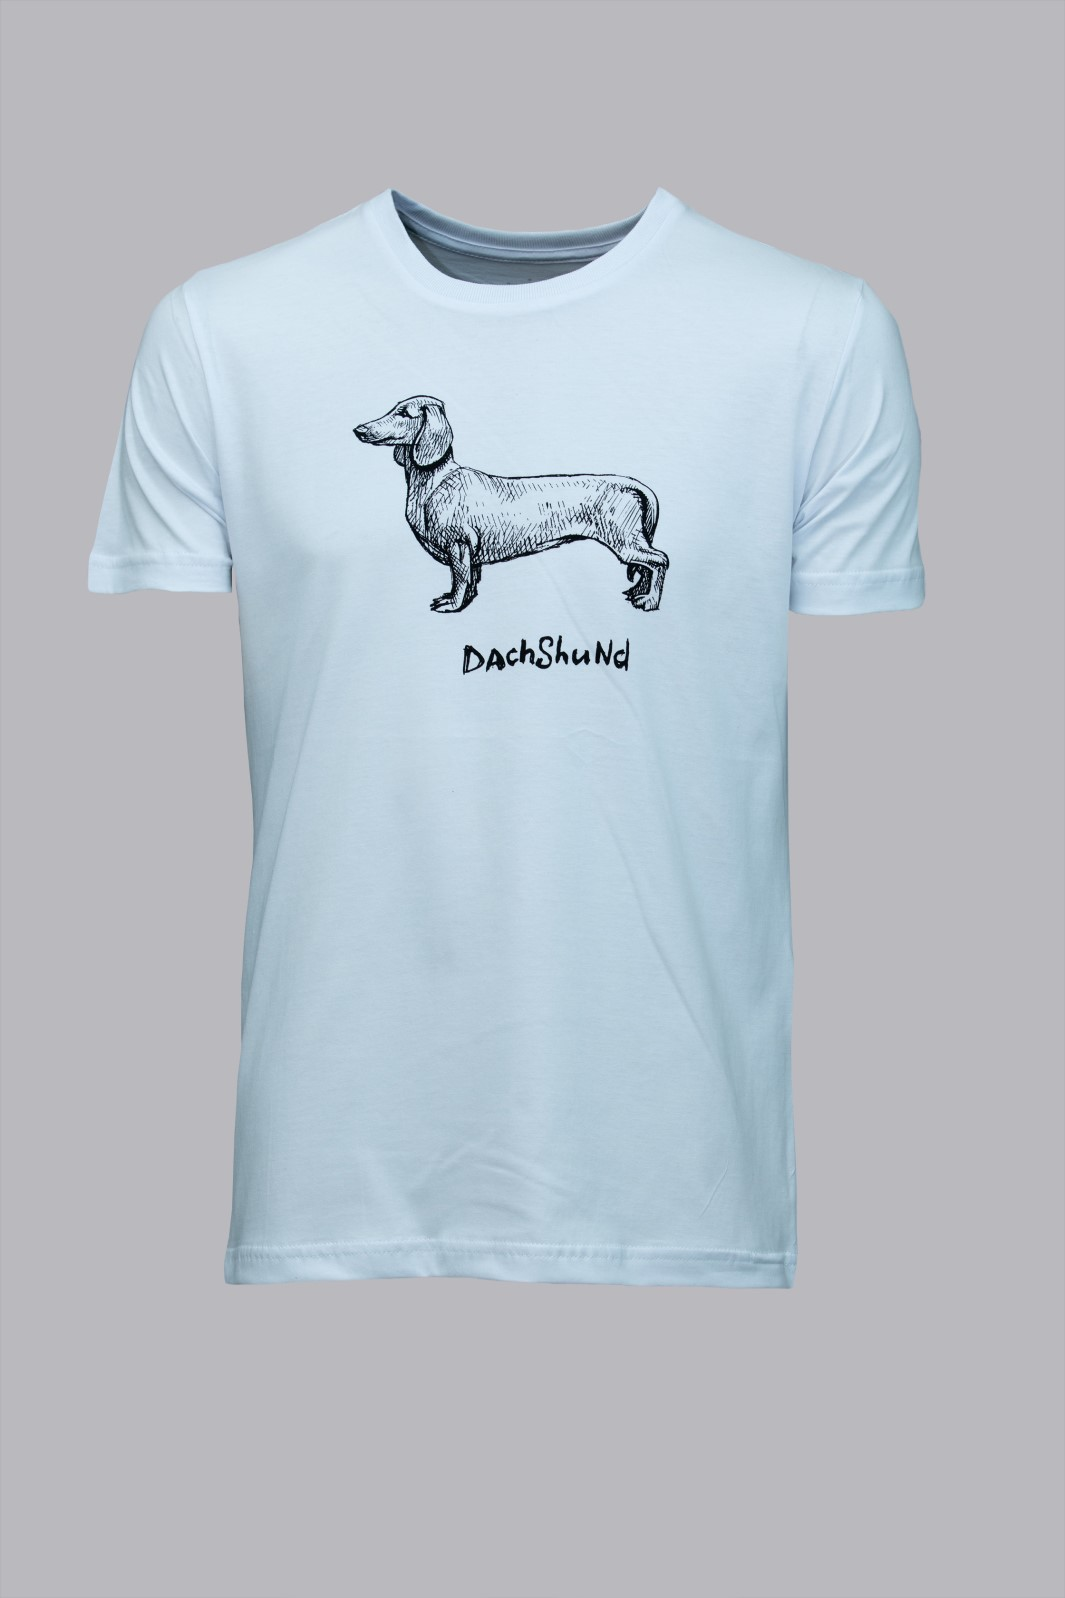 Camiseta CoolWave Dachshund